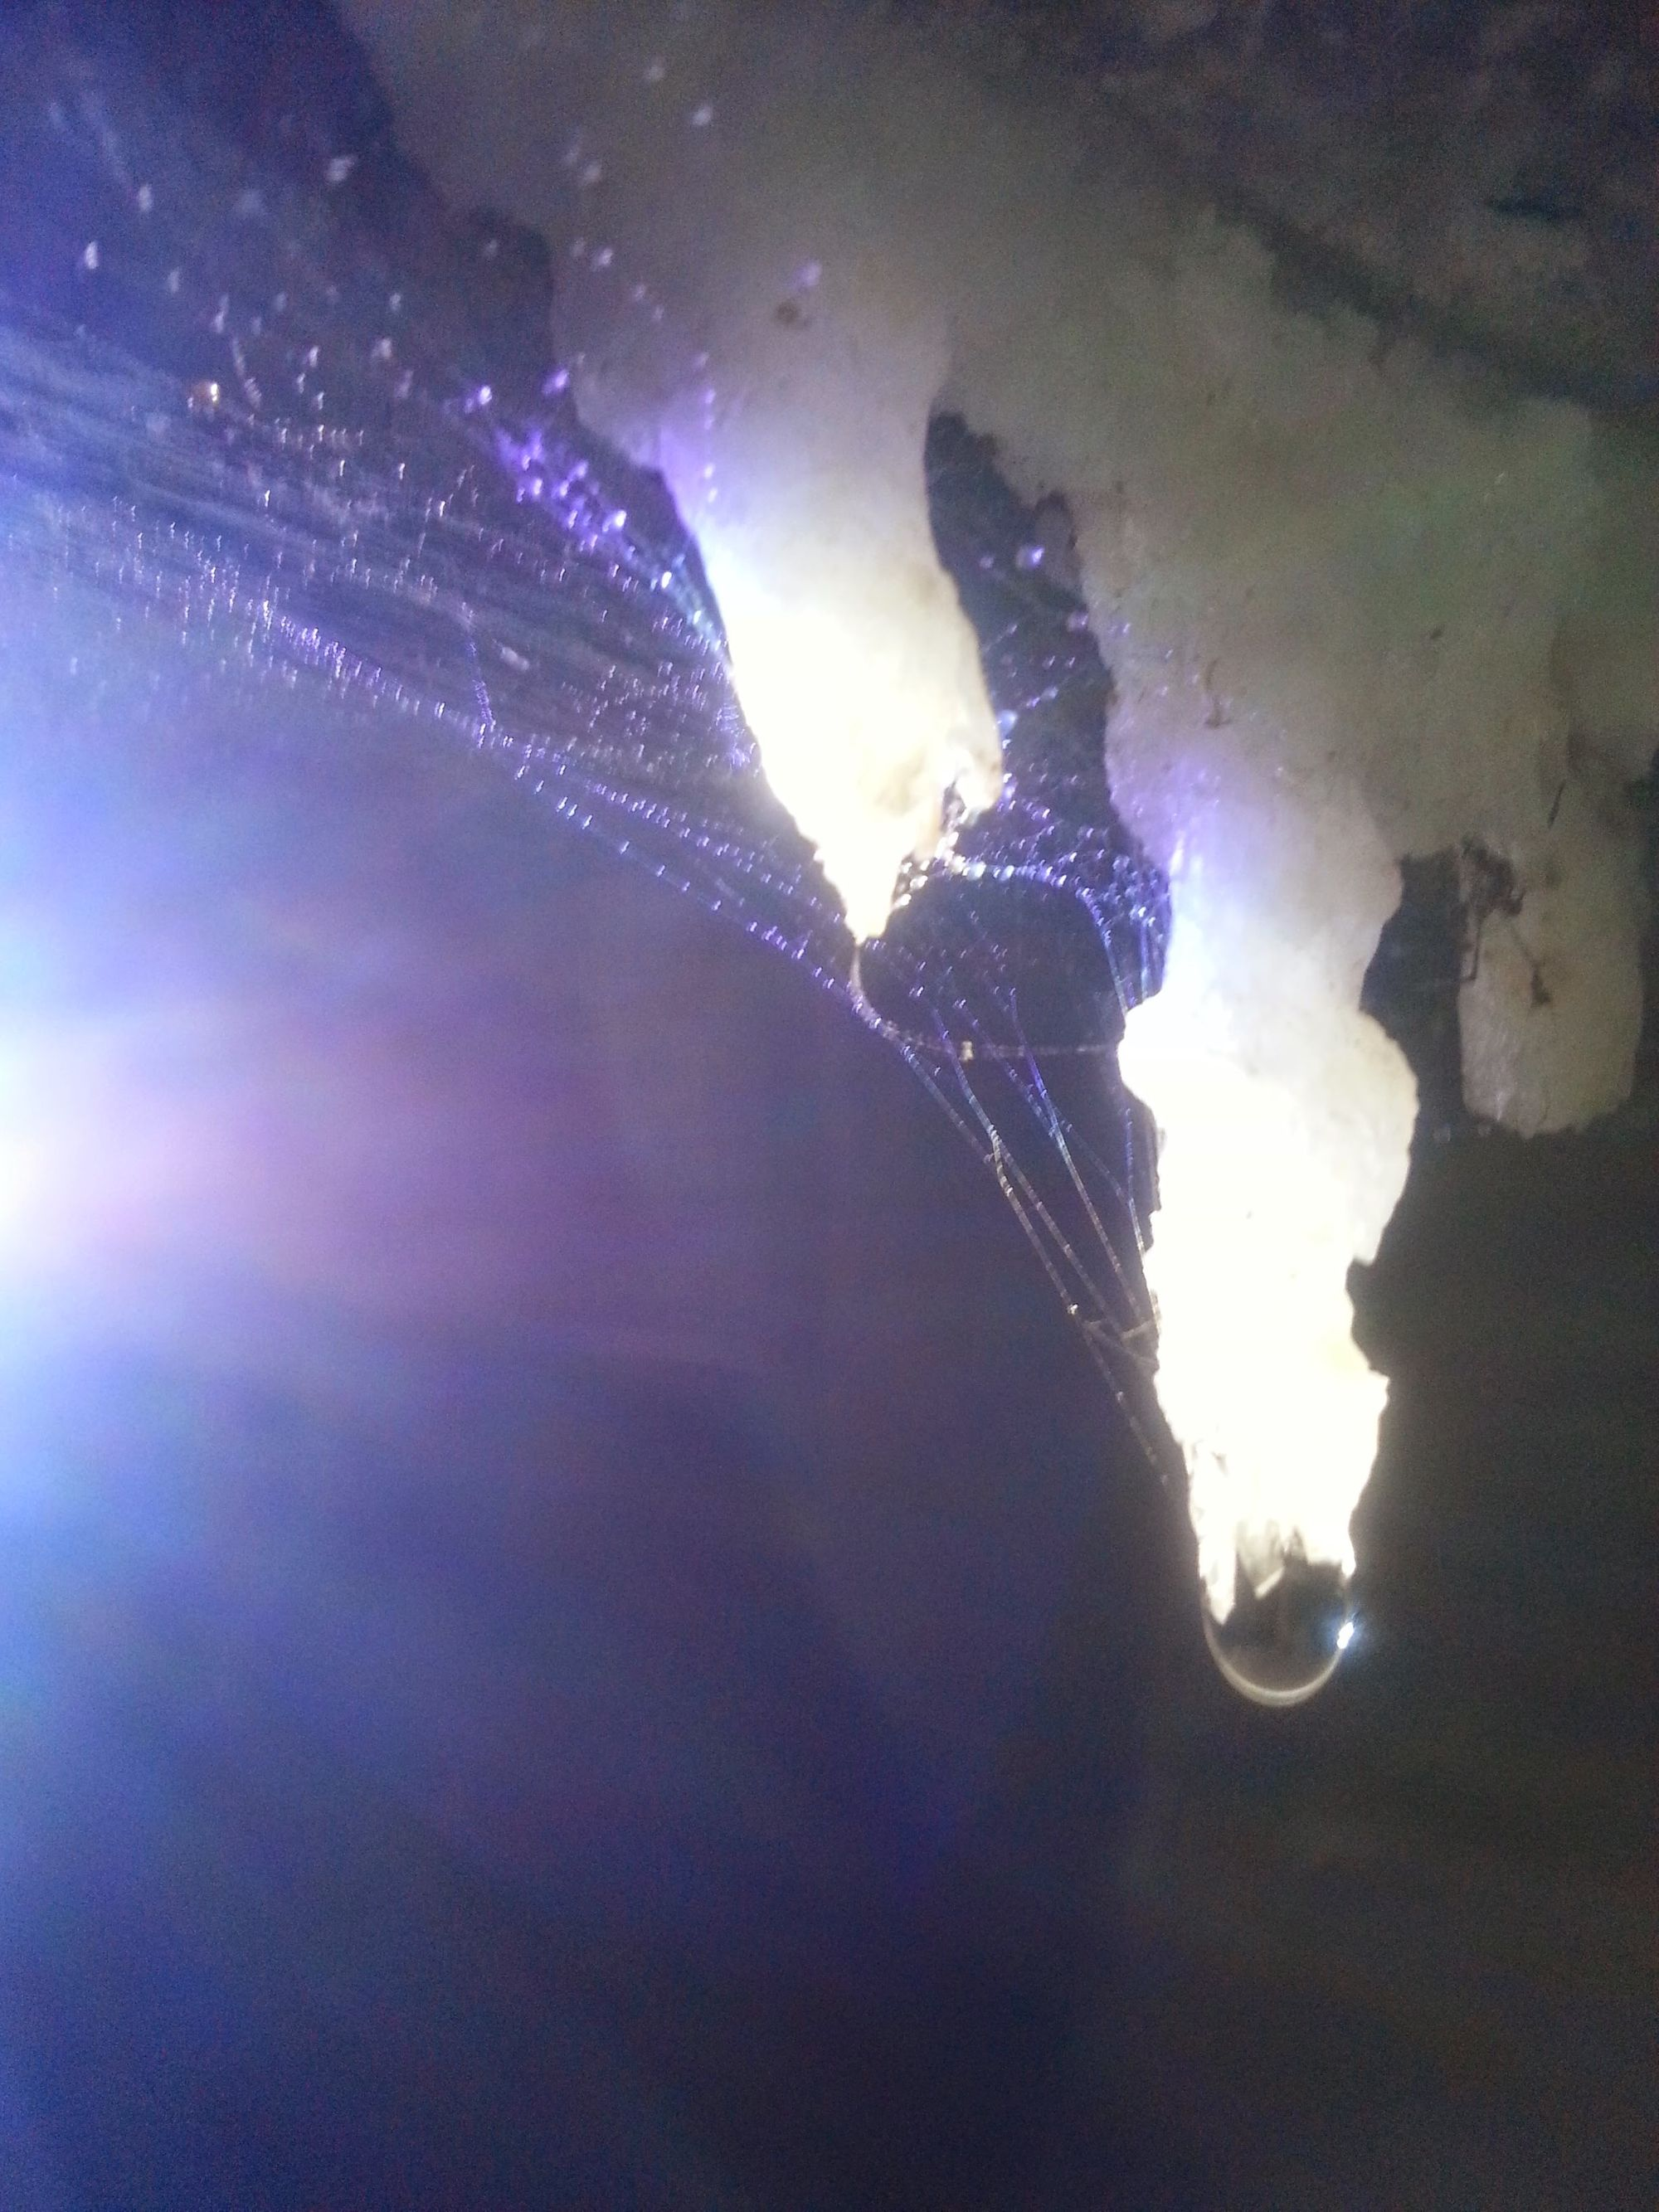 townsville stormwater drain stalactites